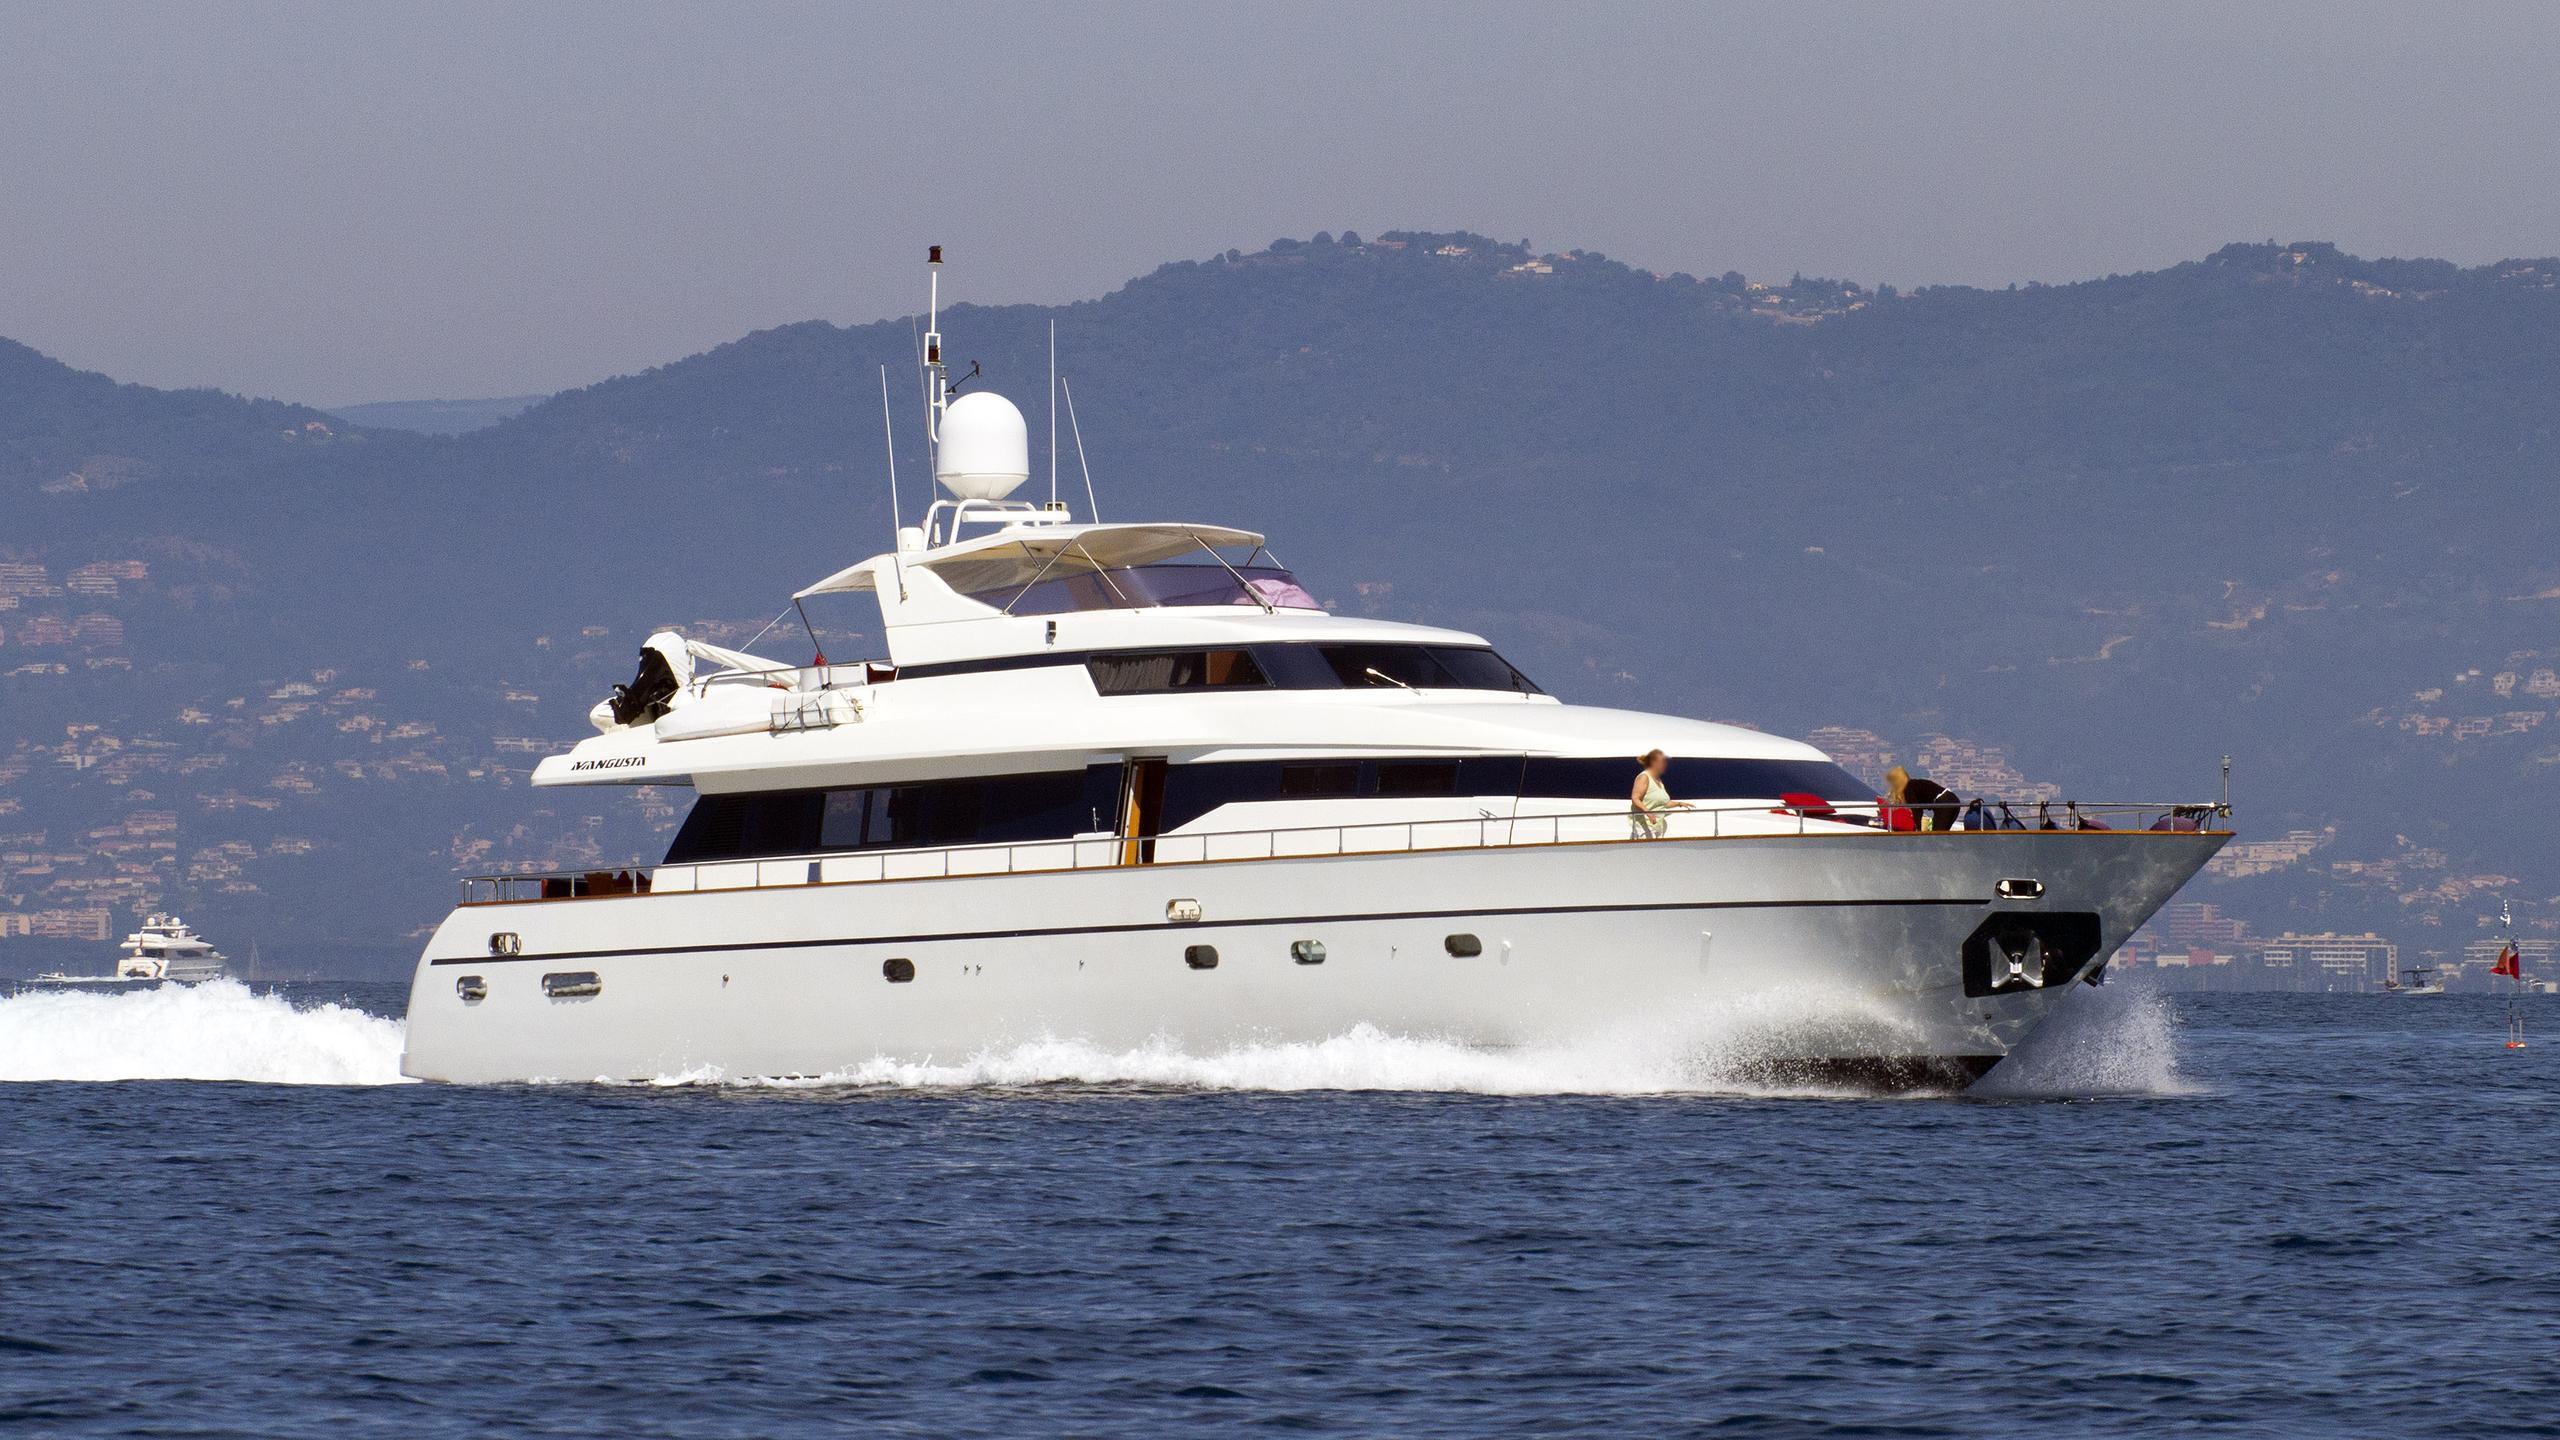 indulgence-of-poole-motor-yacht-versilmarina-1998-26m-running-half-profile